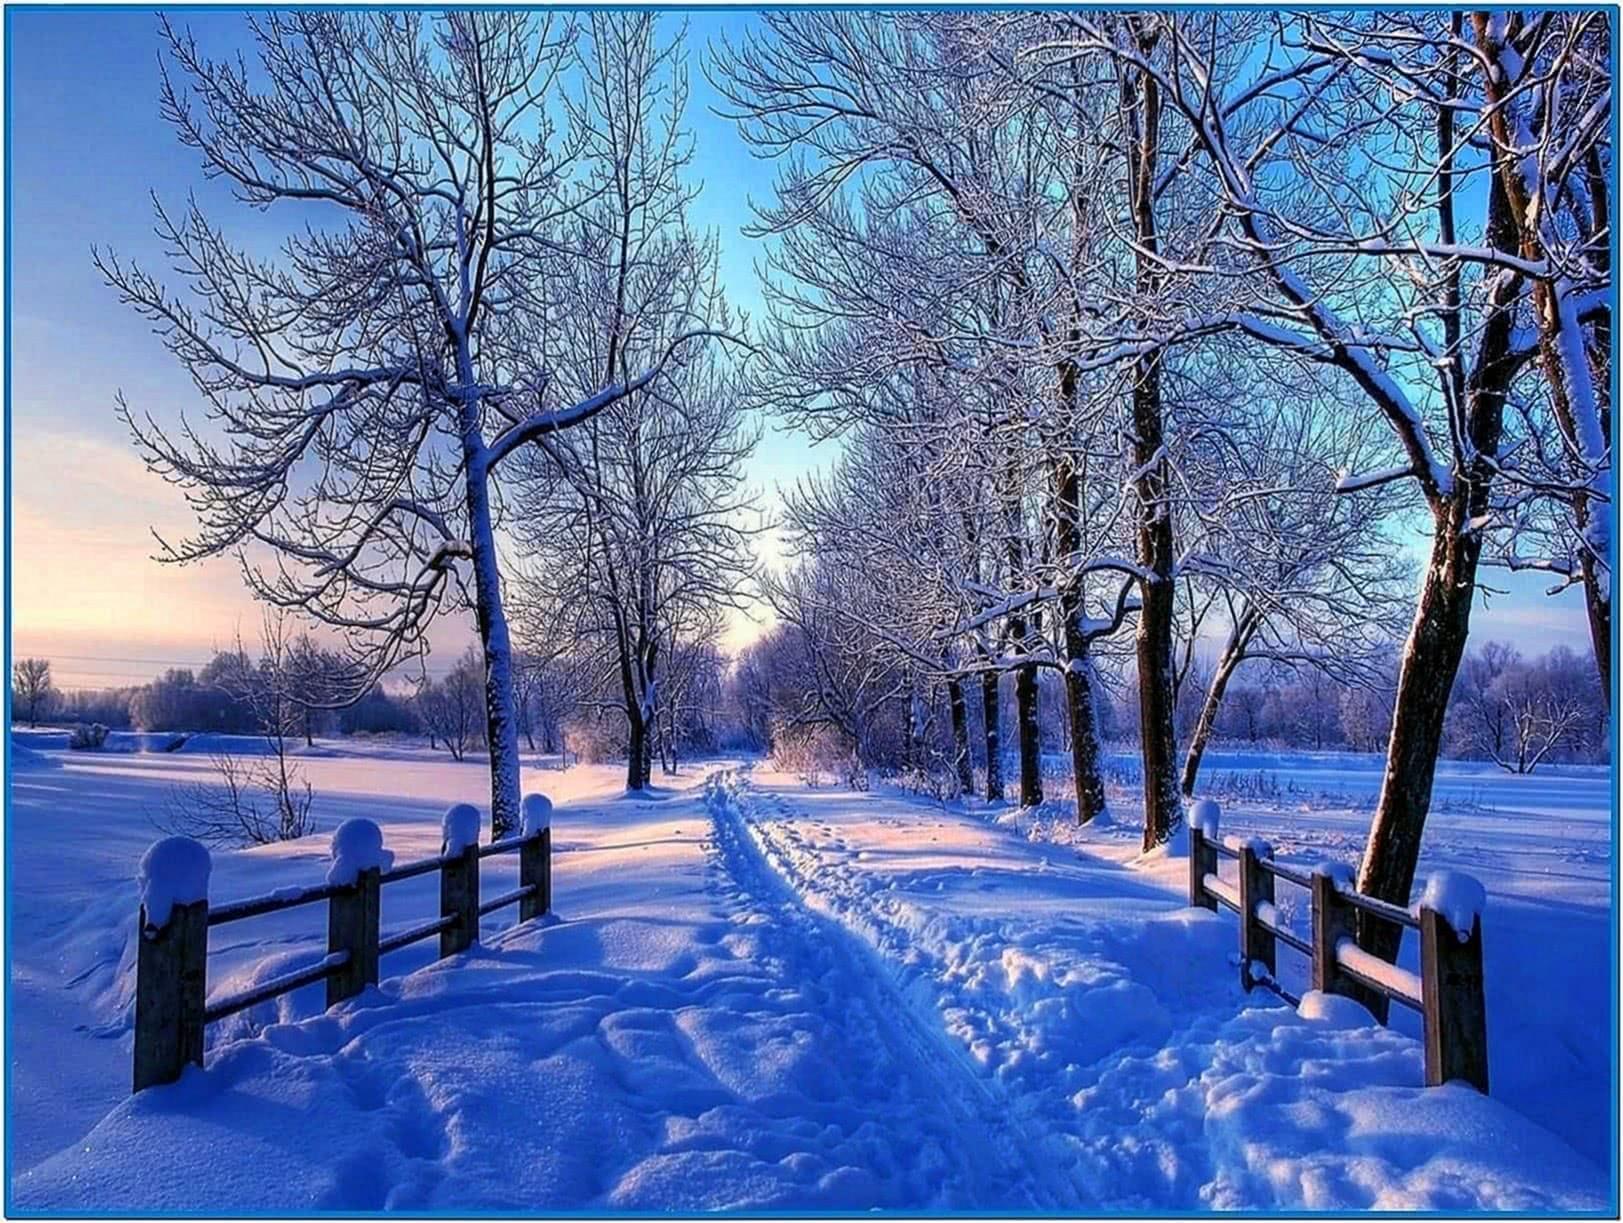 Snowy Winter Screensaver Mac